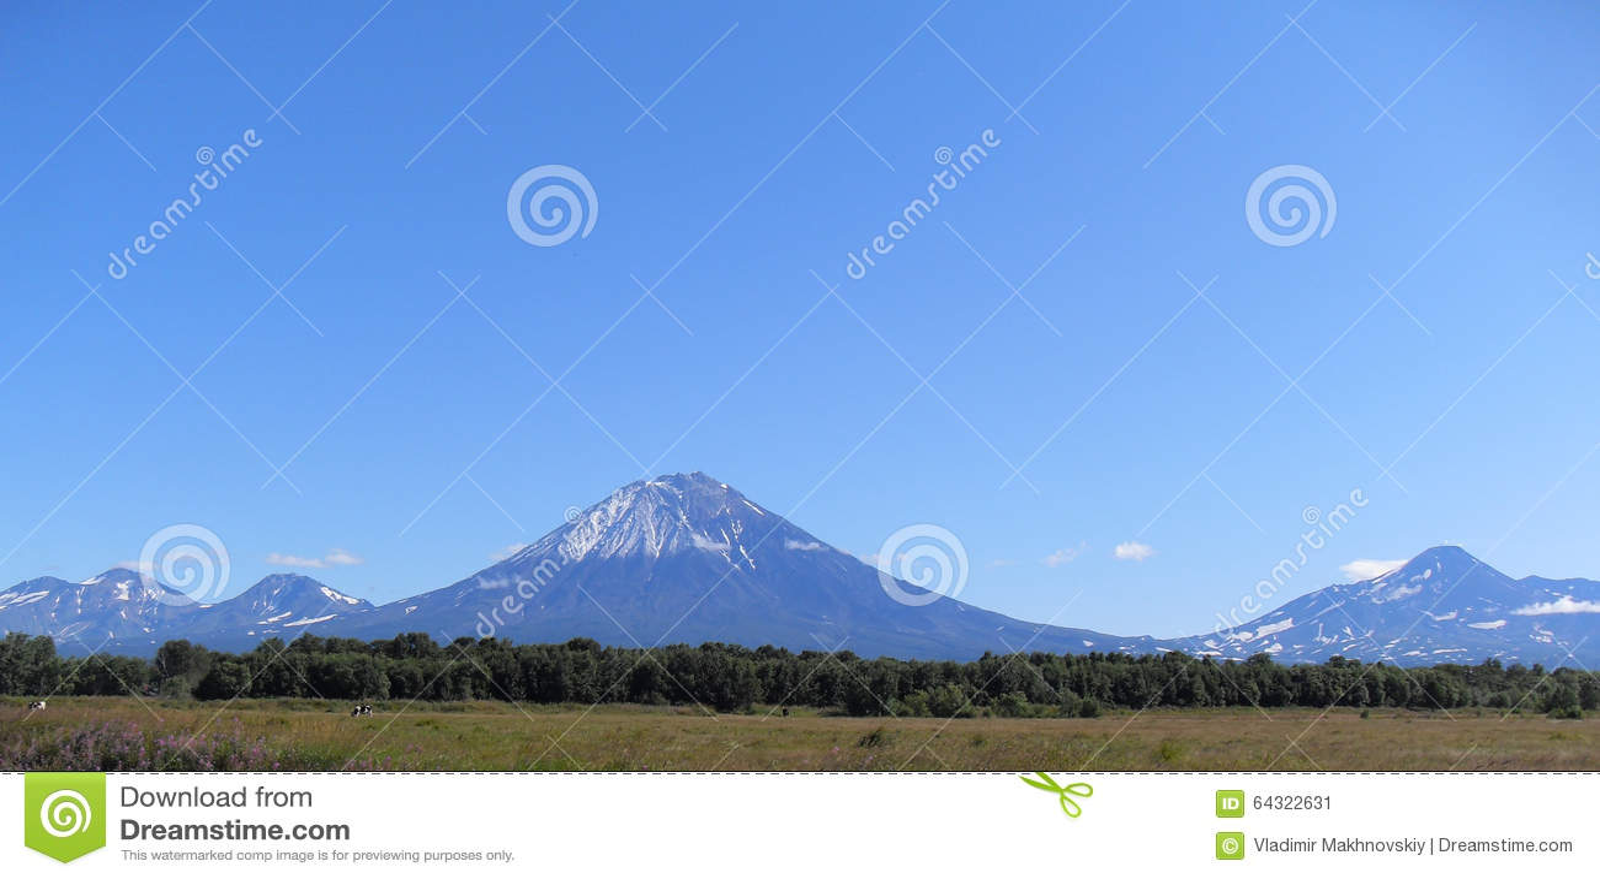 Volcanoes of Kamchatka in the summer